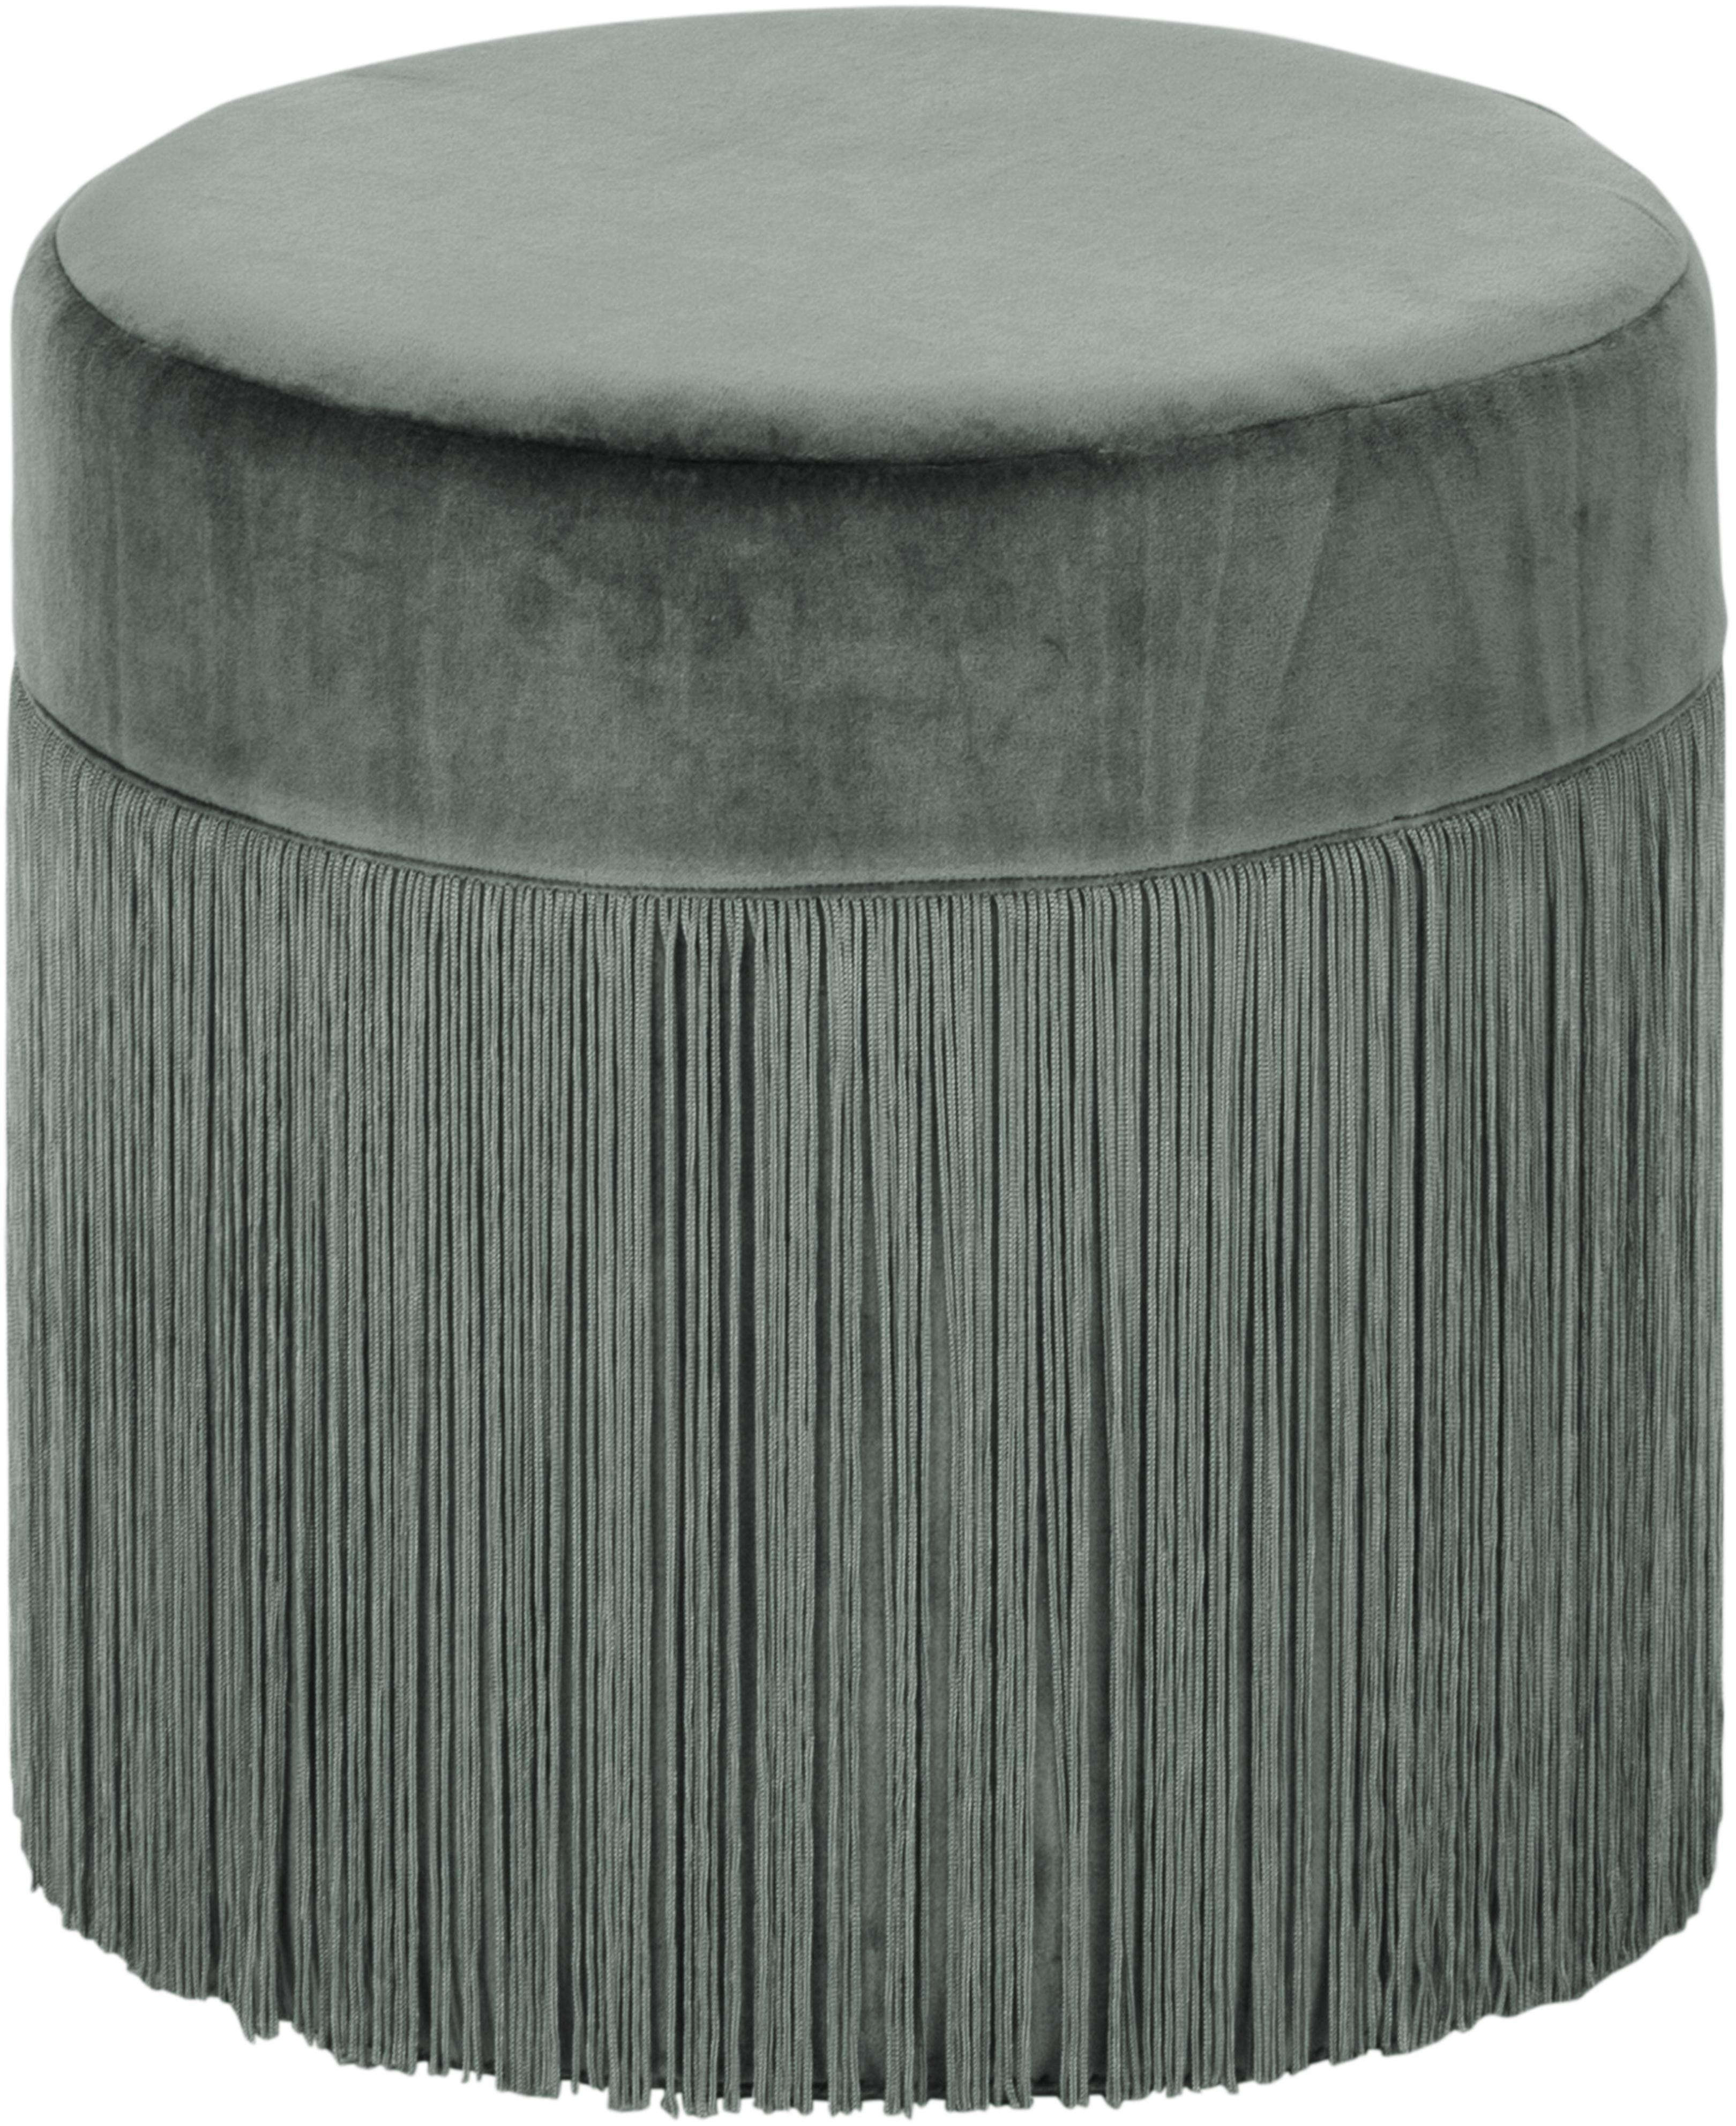 Puf con flecos Adriana, Tapizado: terciopelo de algodón, Flecos: viscosa, Verde salvia, Ø 40 x Al 40 cm